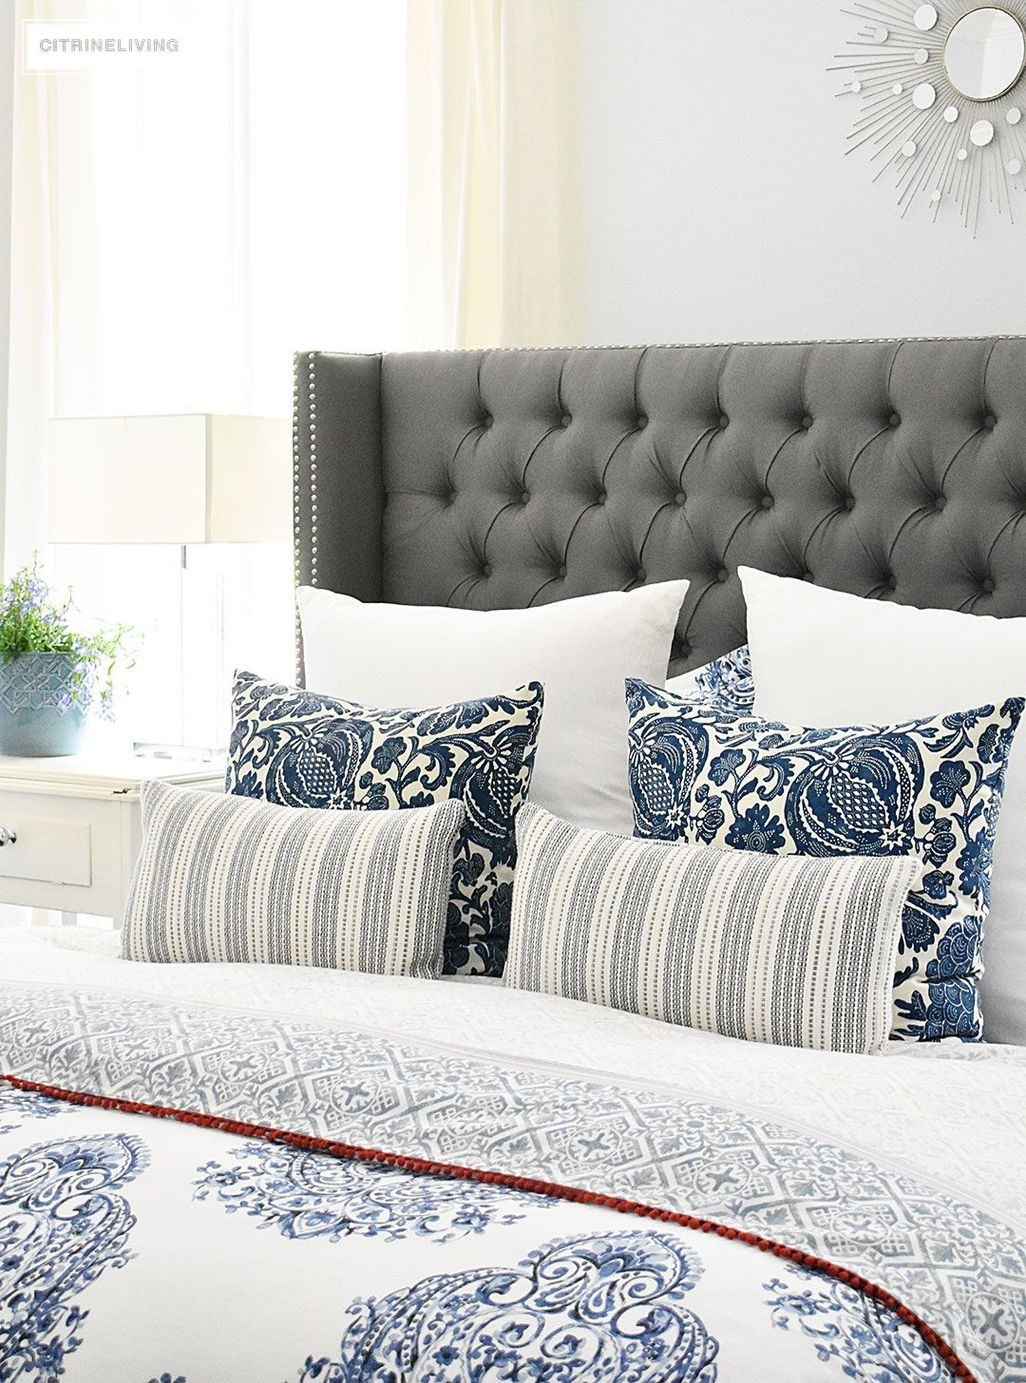 40 Adorable Modern Bedroom Designs Cheer Teenager - TREND4HOMY